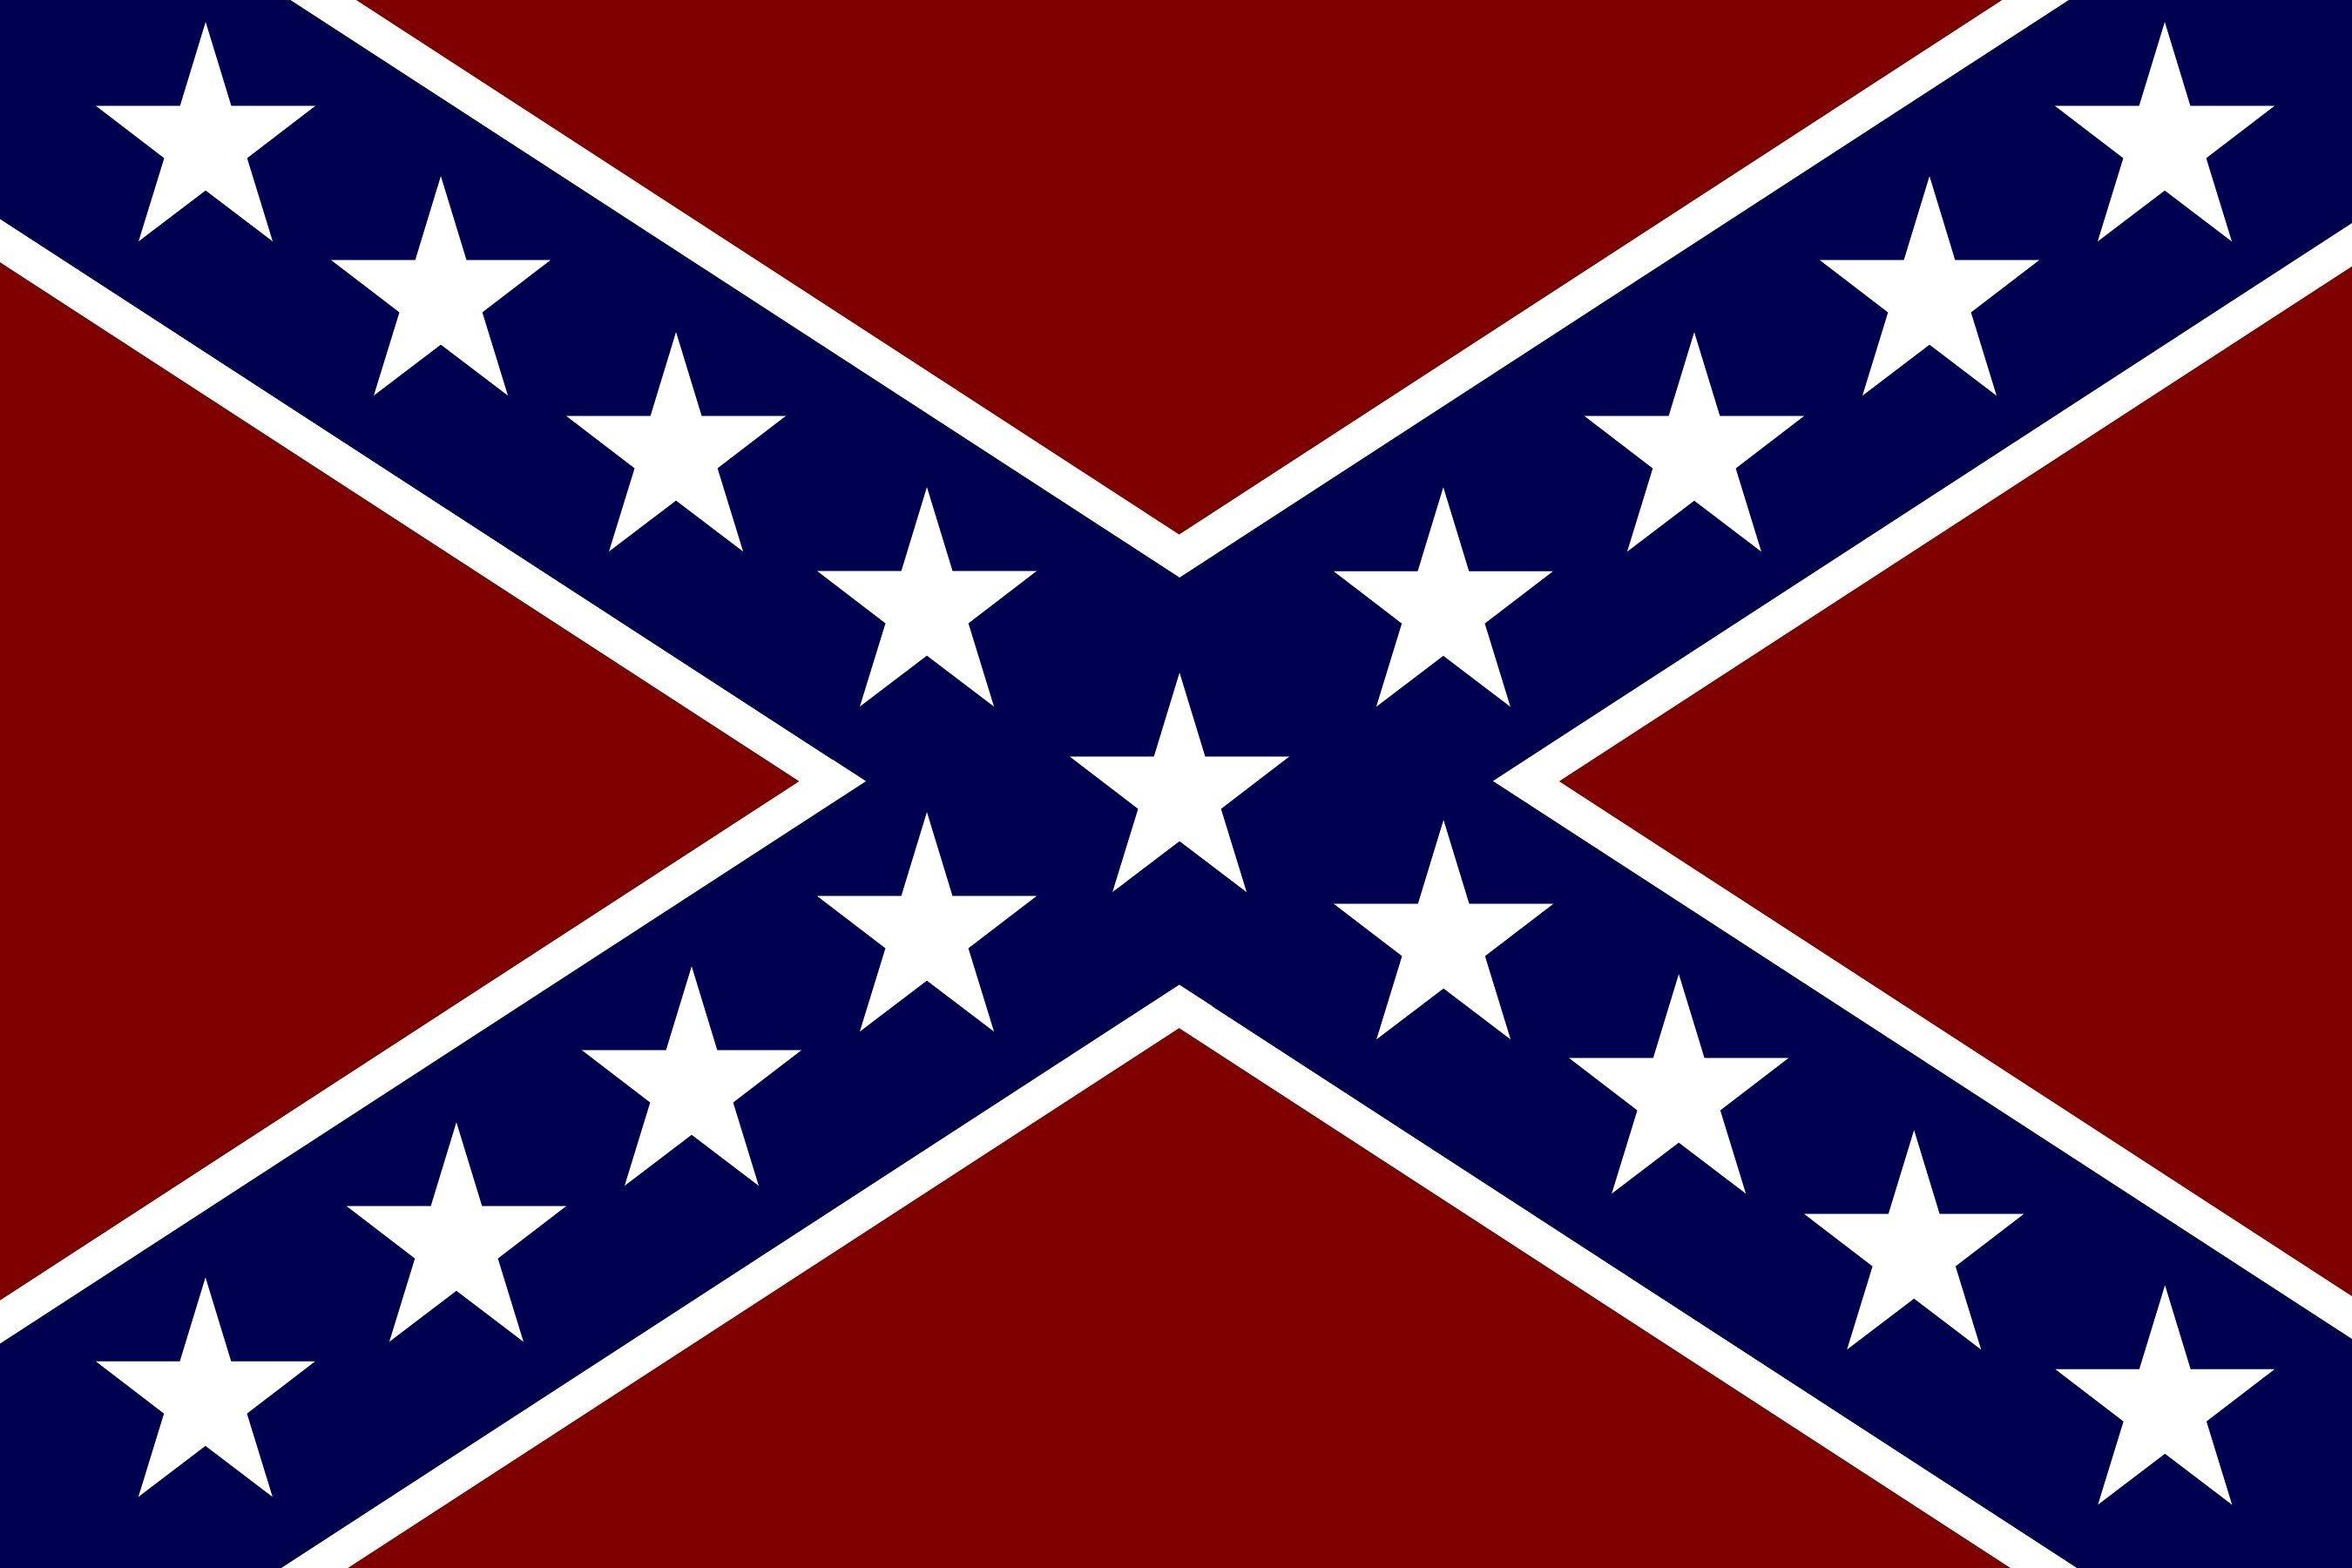 CONFEDERATE flag usa america united states csa civil war rebel dixie 2700x1800